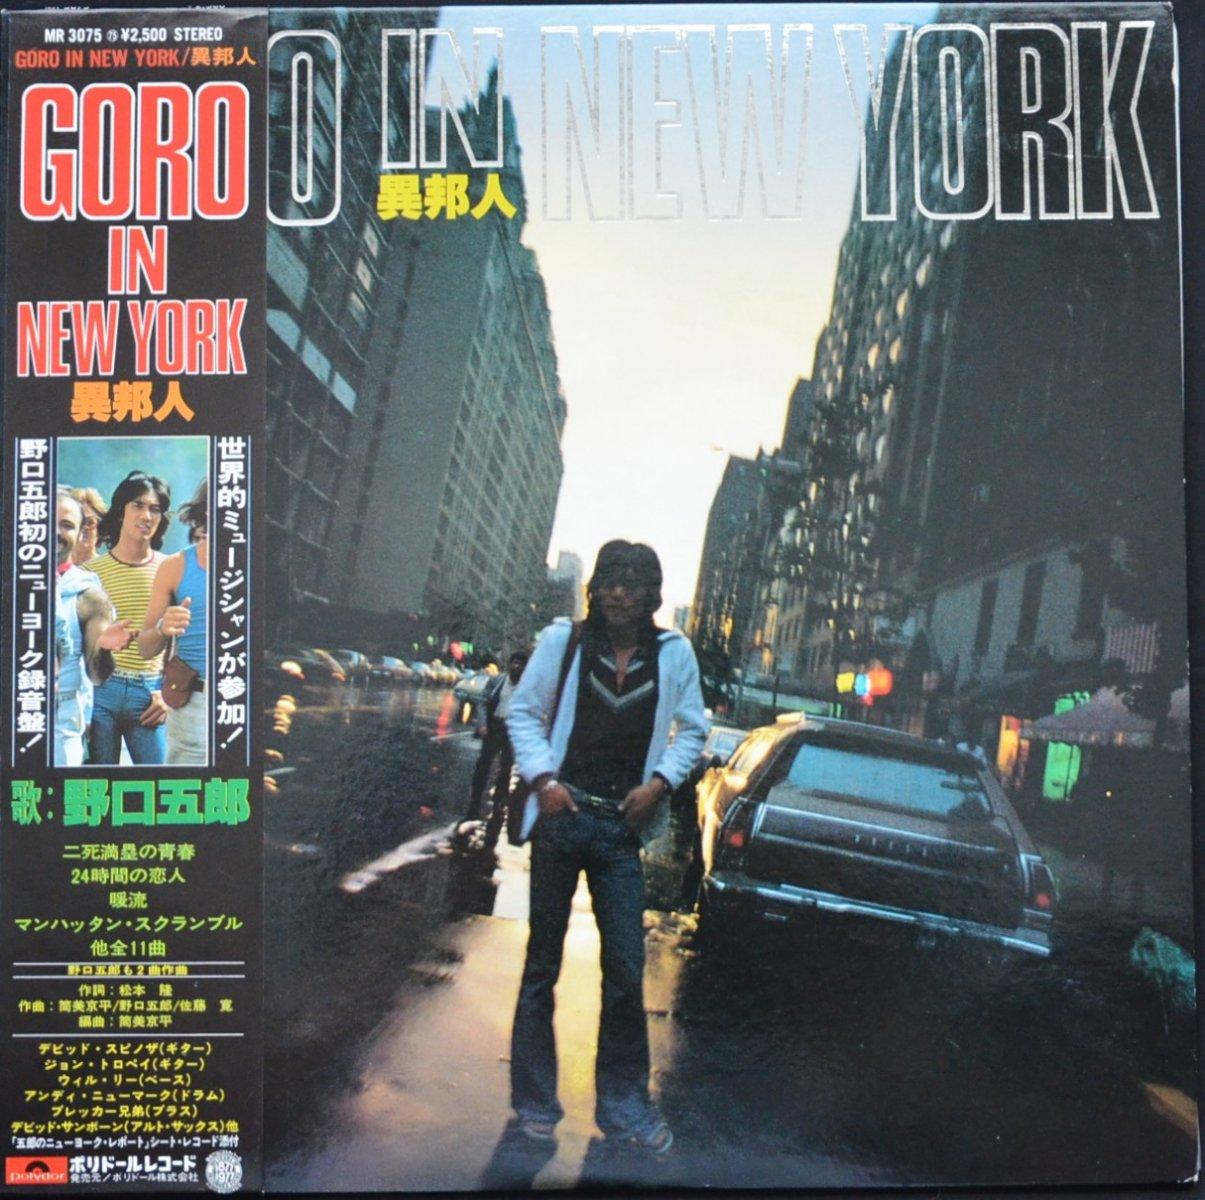 野口五郎 GORO NOGUCHI / 異邦人 GORO IN NEW YORK (LP)